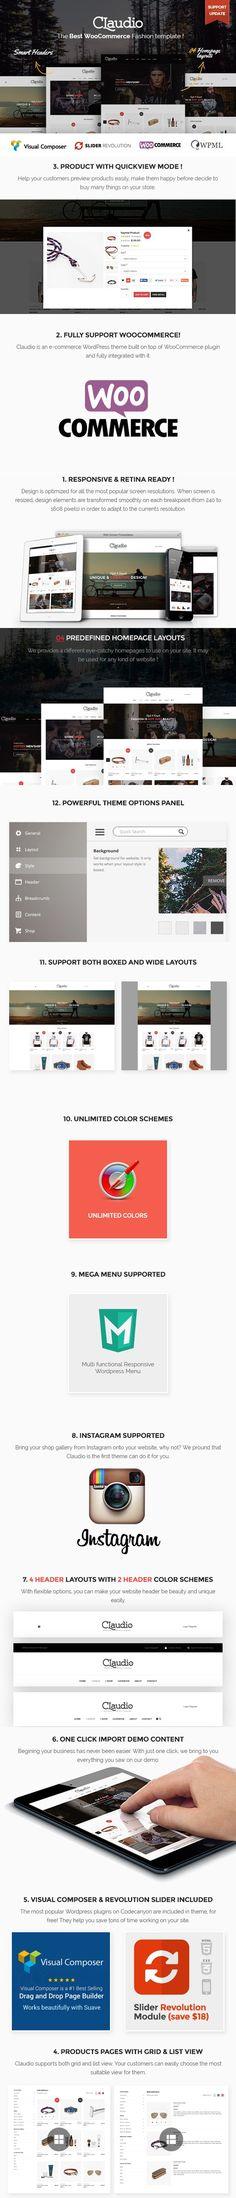 Claudio - Modern Ecommerce Theme. Photoshop Plugins. $59.00